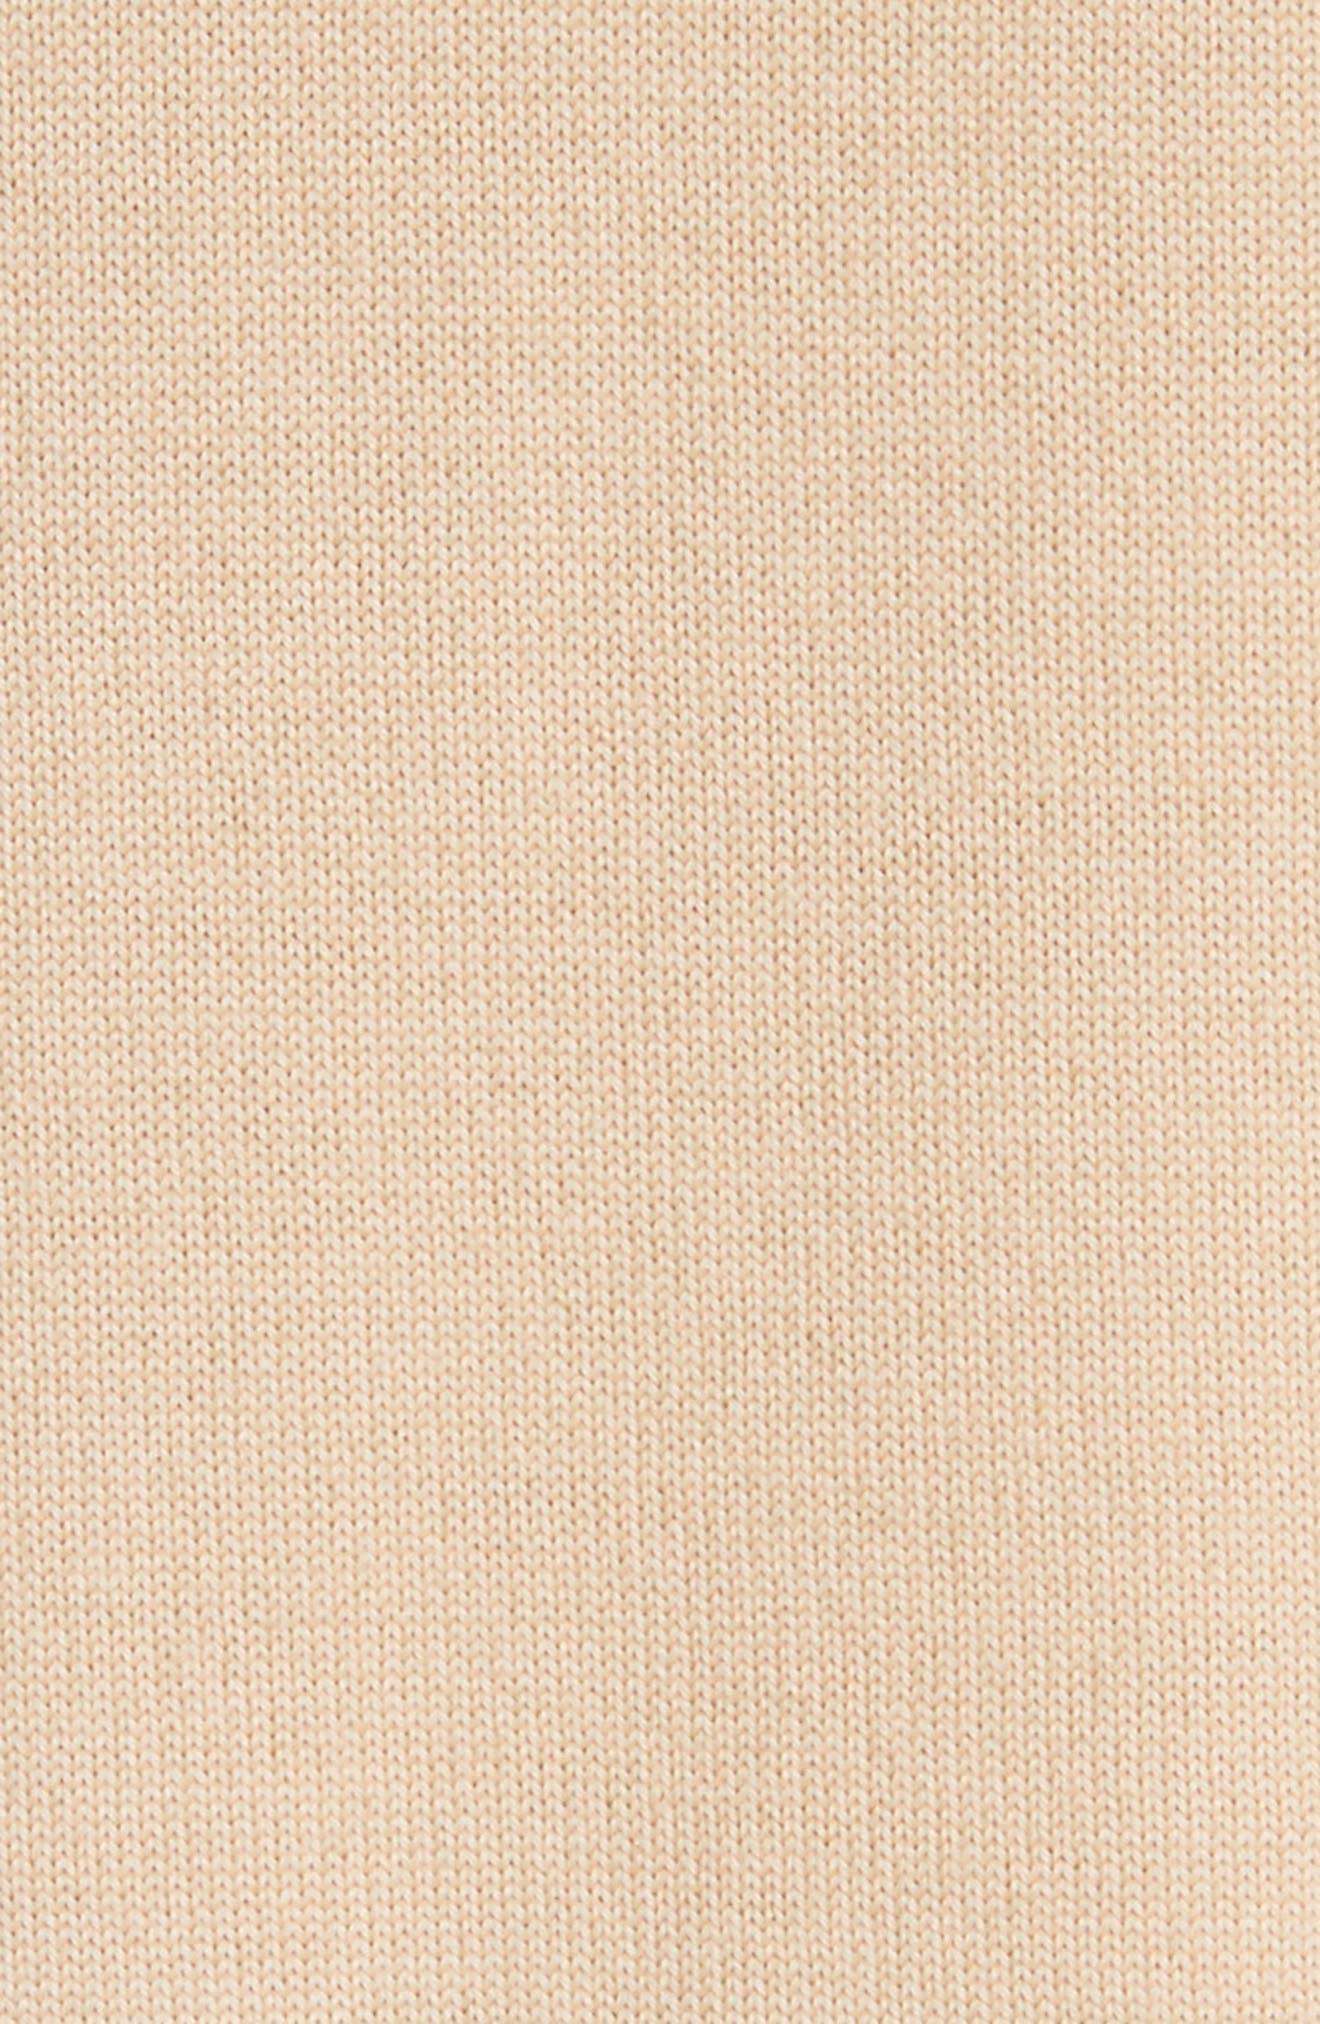 Stripe Jersey Knit Cardigan,                             Alternate thumbnail 5, color,                             WHITE MULTI